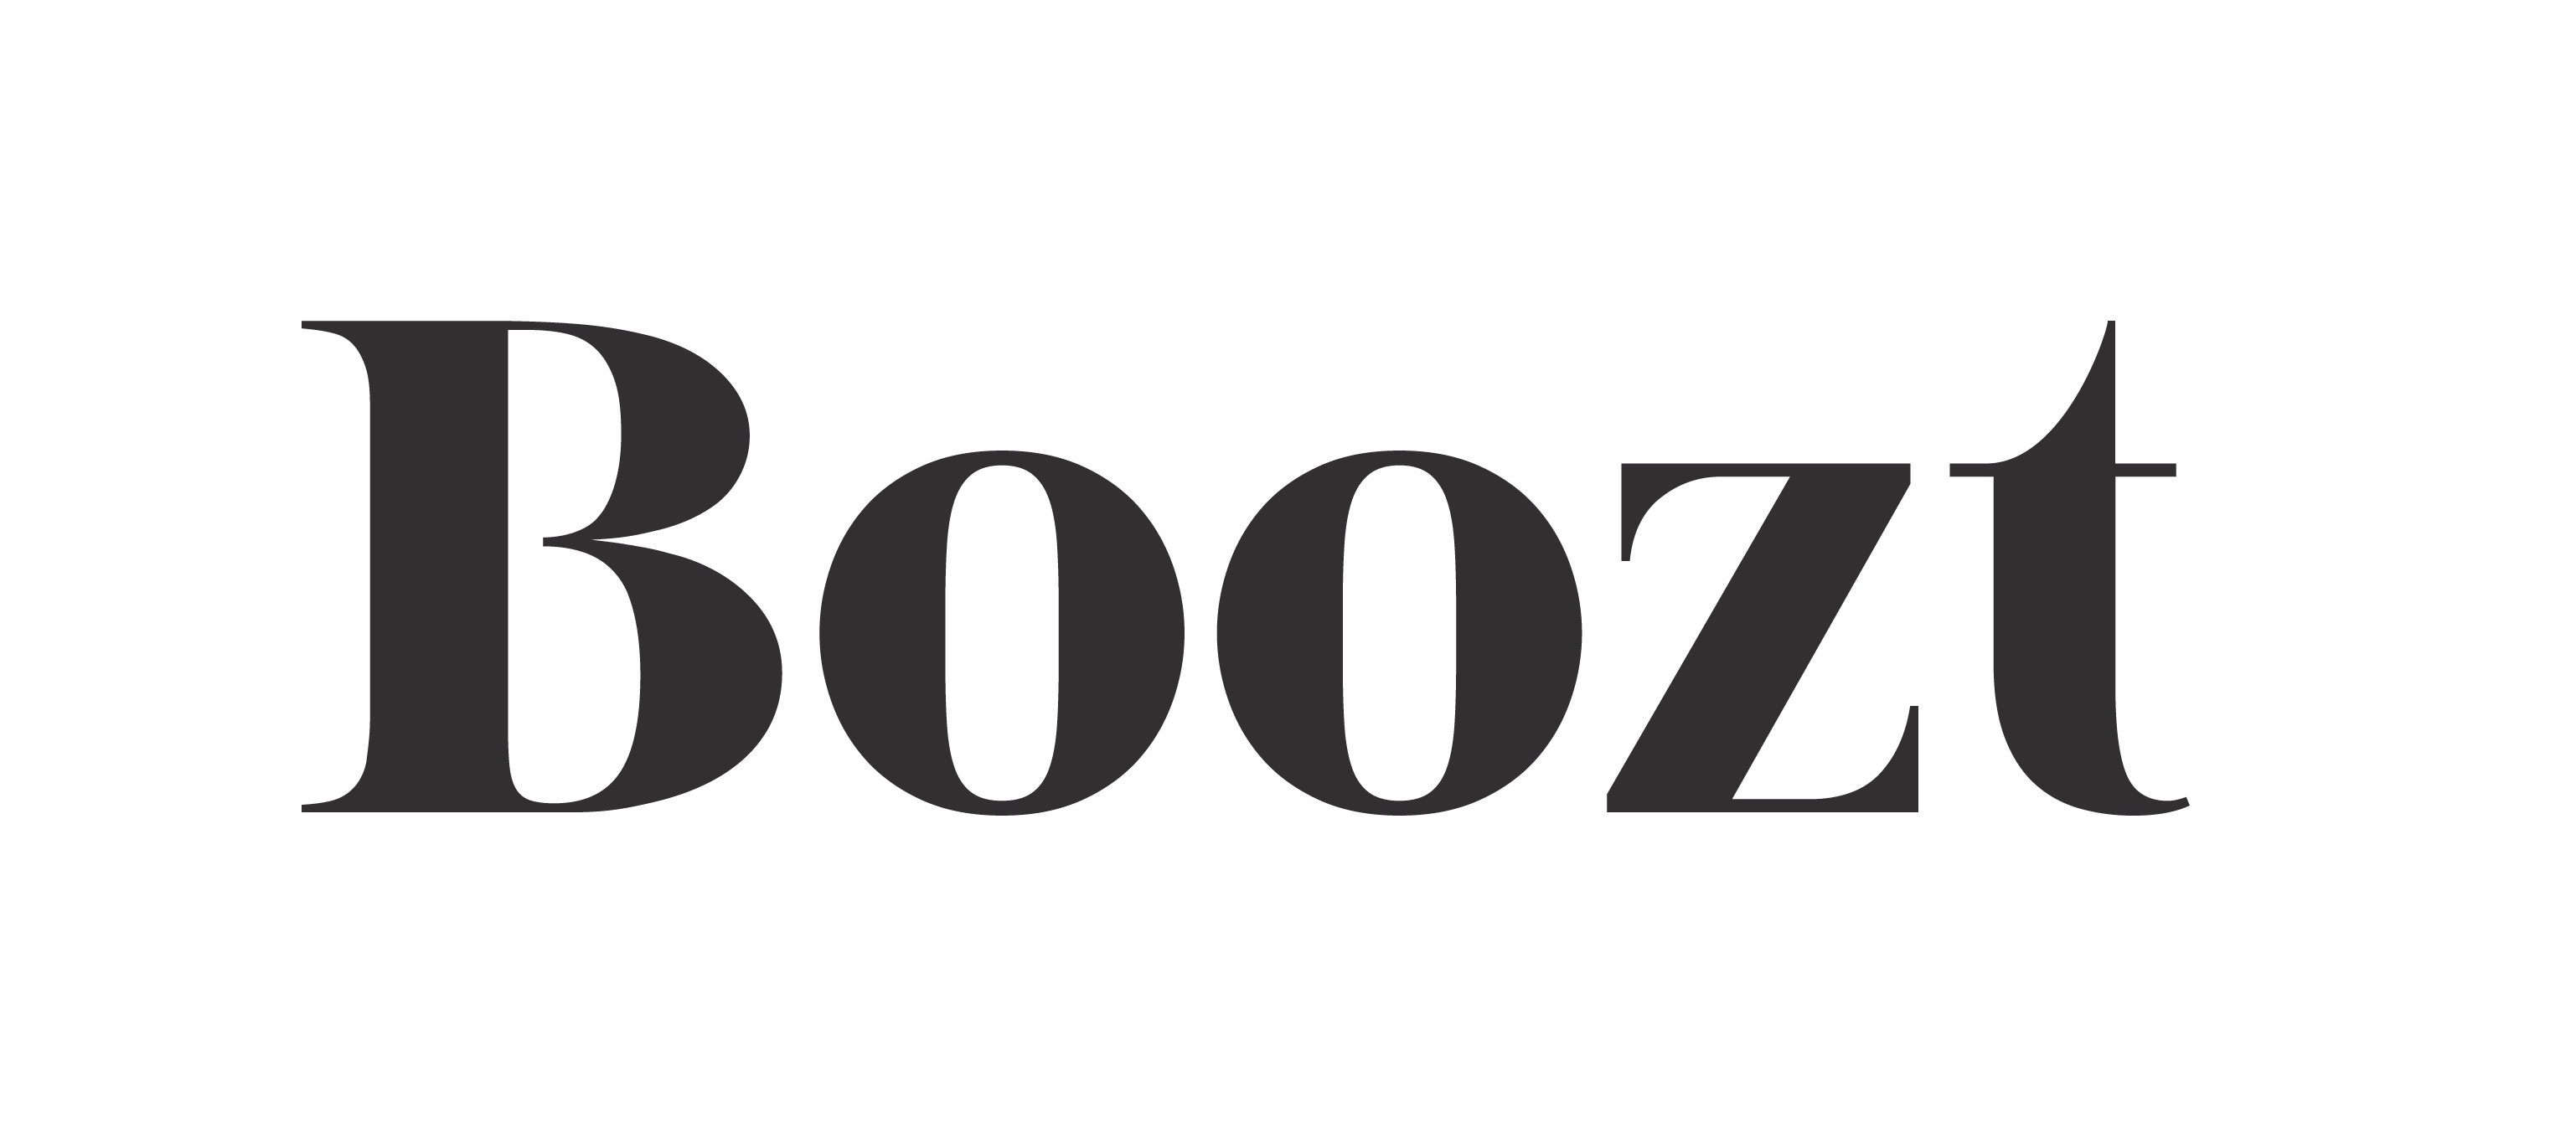 Boozt logo 2